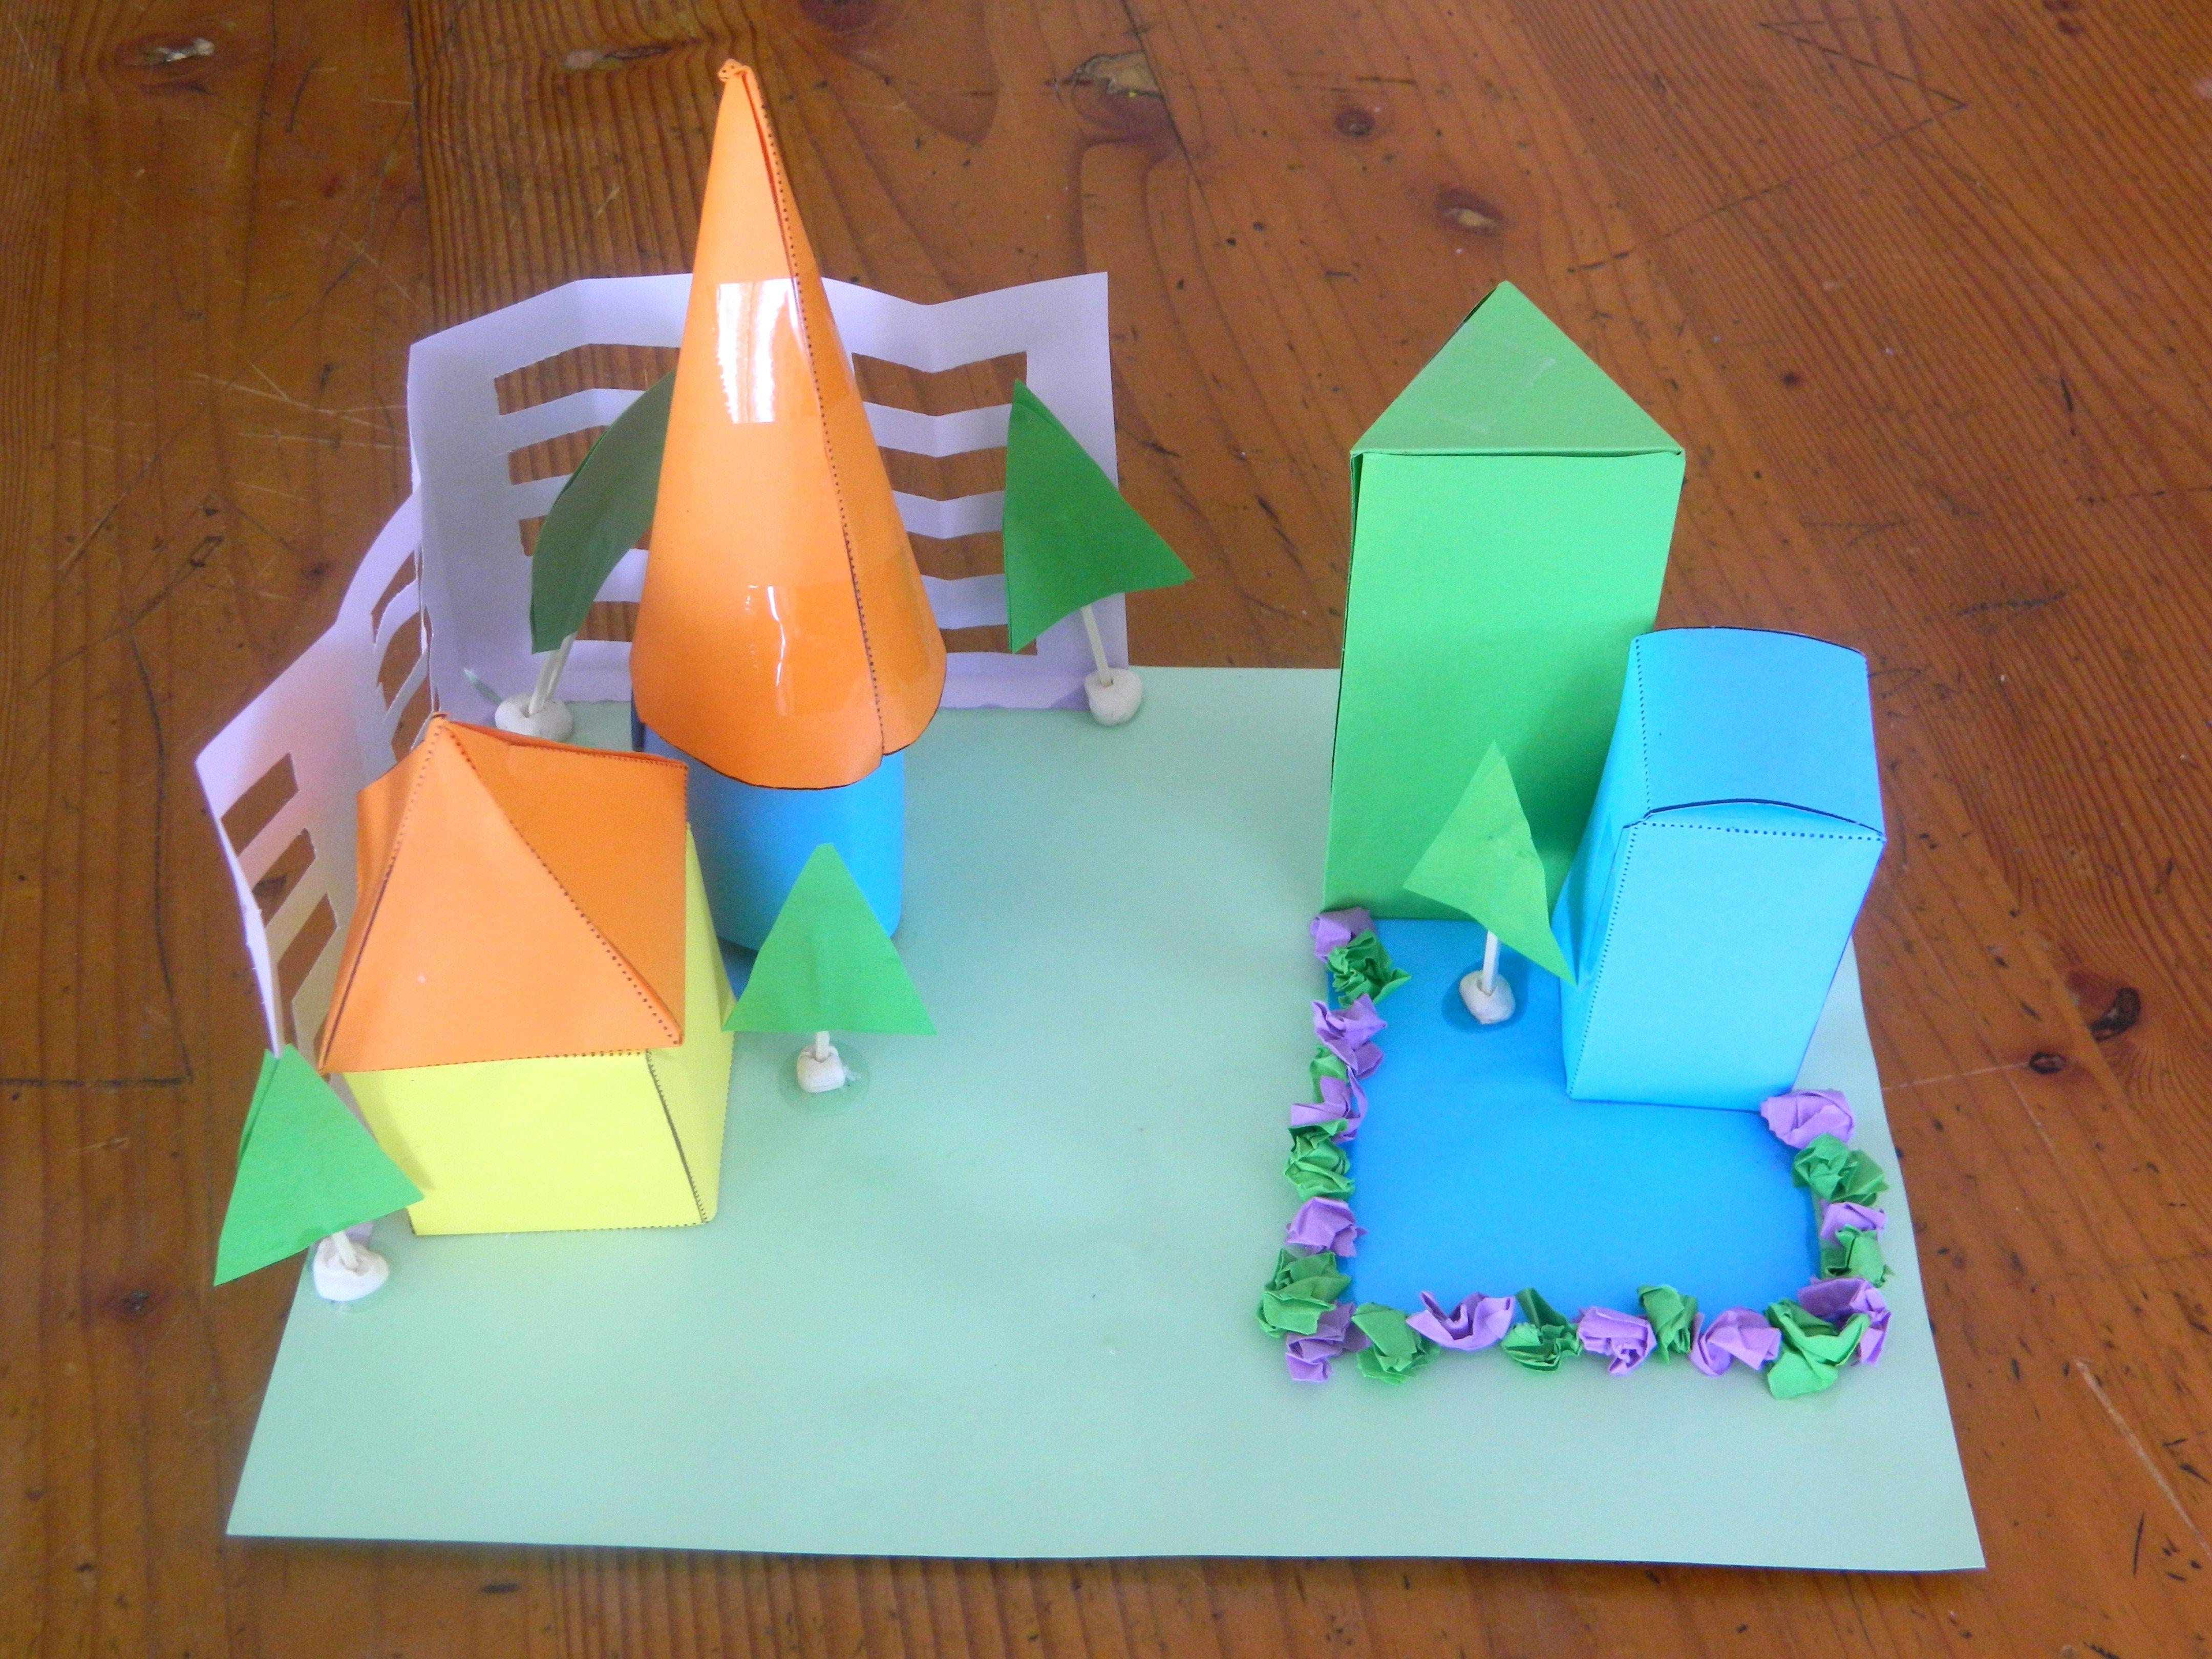 Use 3d Shape Nets To Create A Cardboard Construction